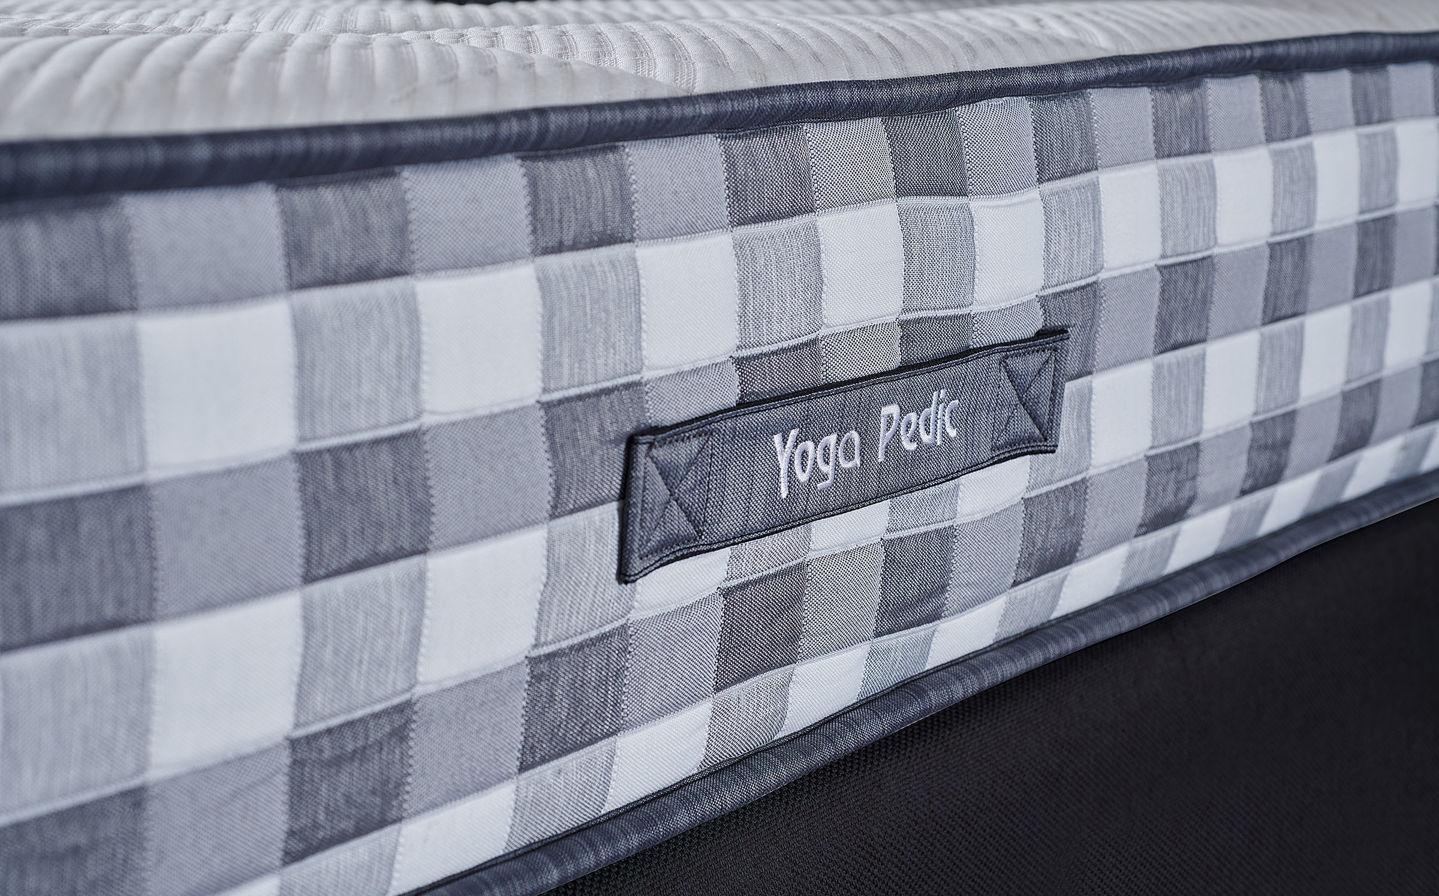 Yoga Pedic Yatak 90 X 190